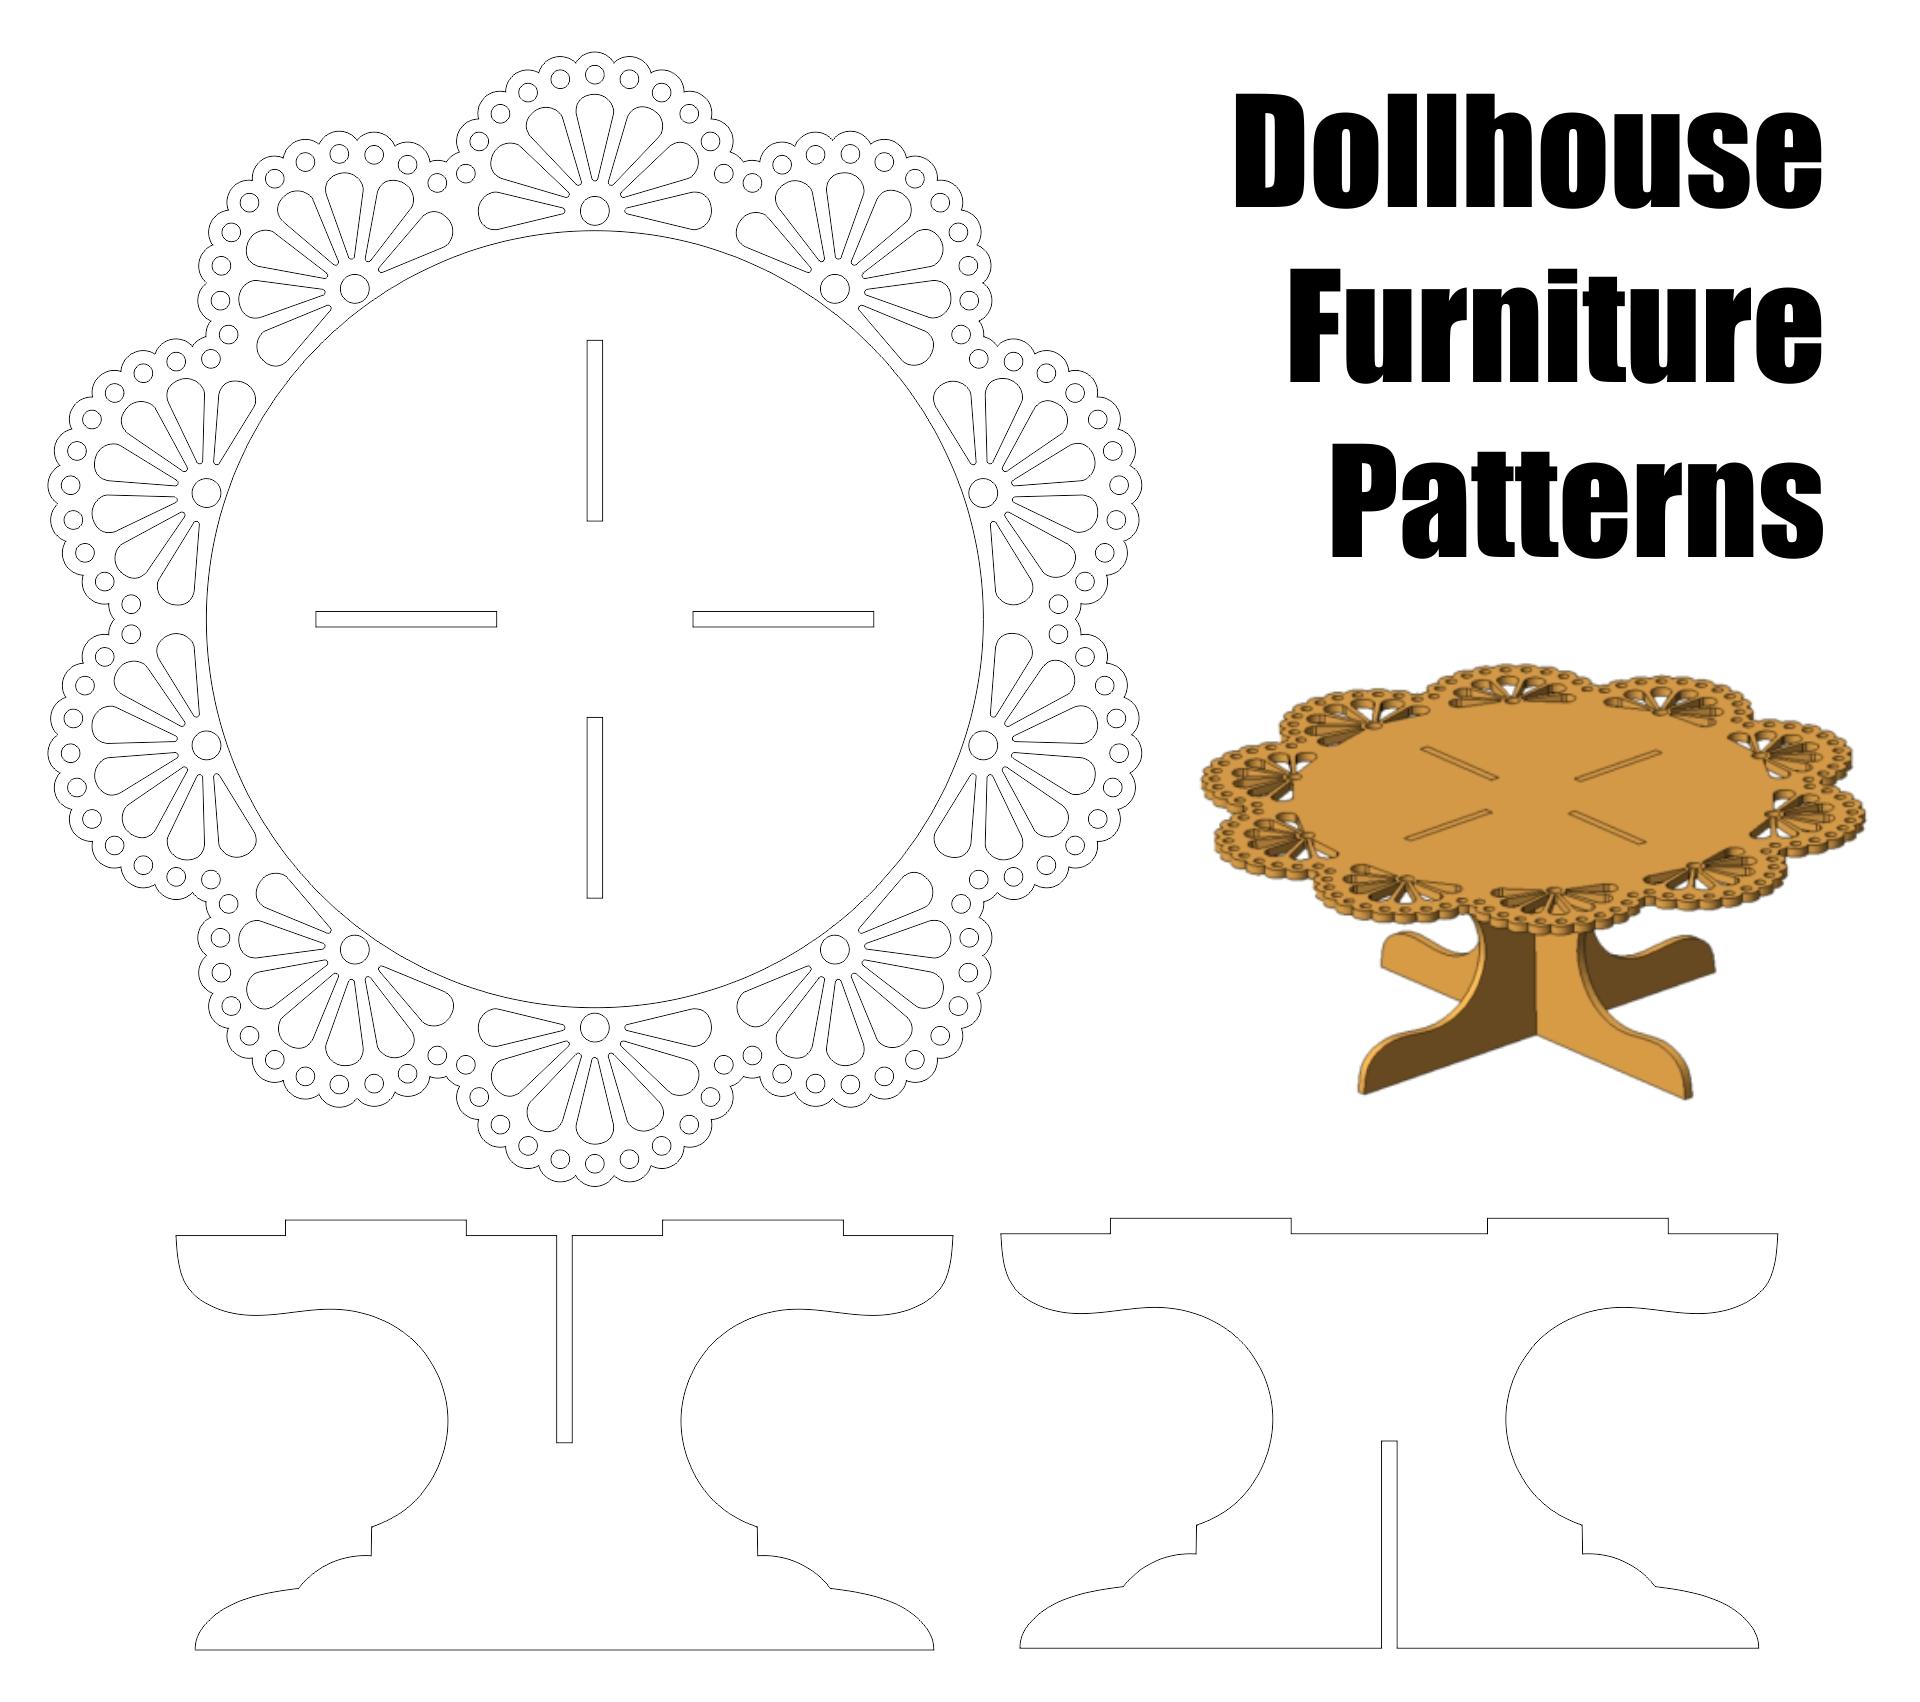 Kitchen design graph paper - Of Printable Dollhouse Furniture Patterns Free Printable Paper